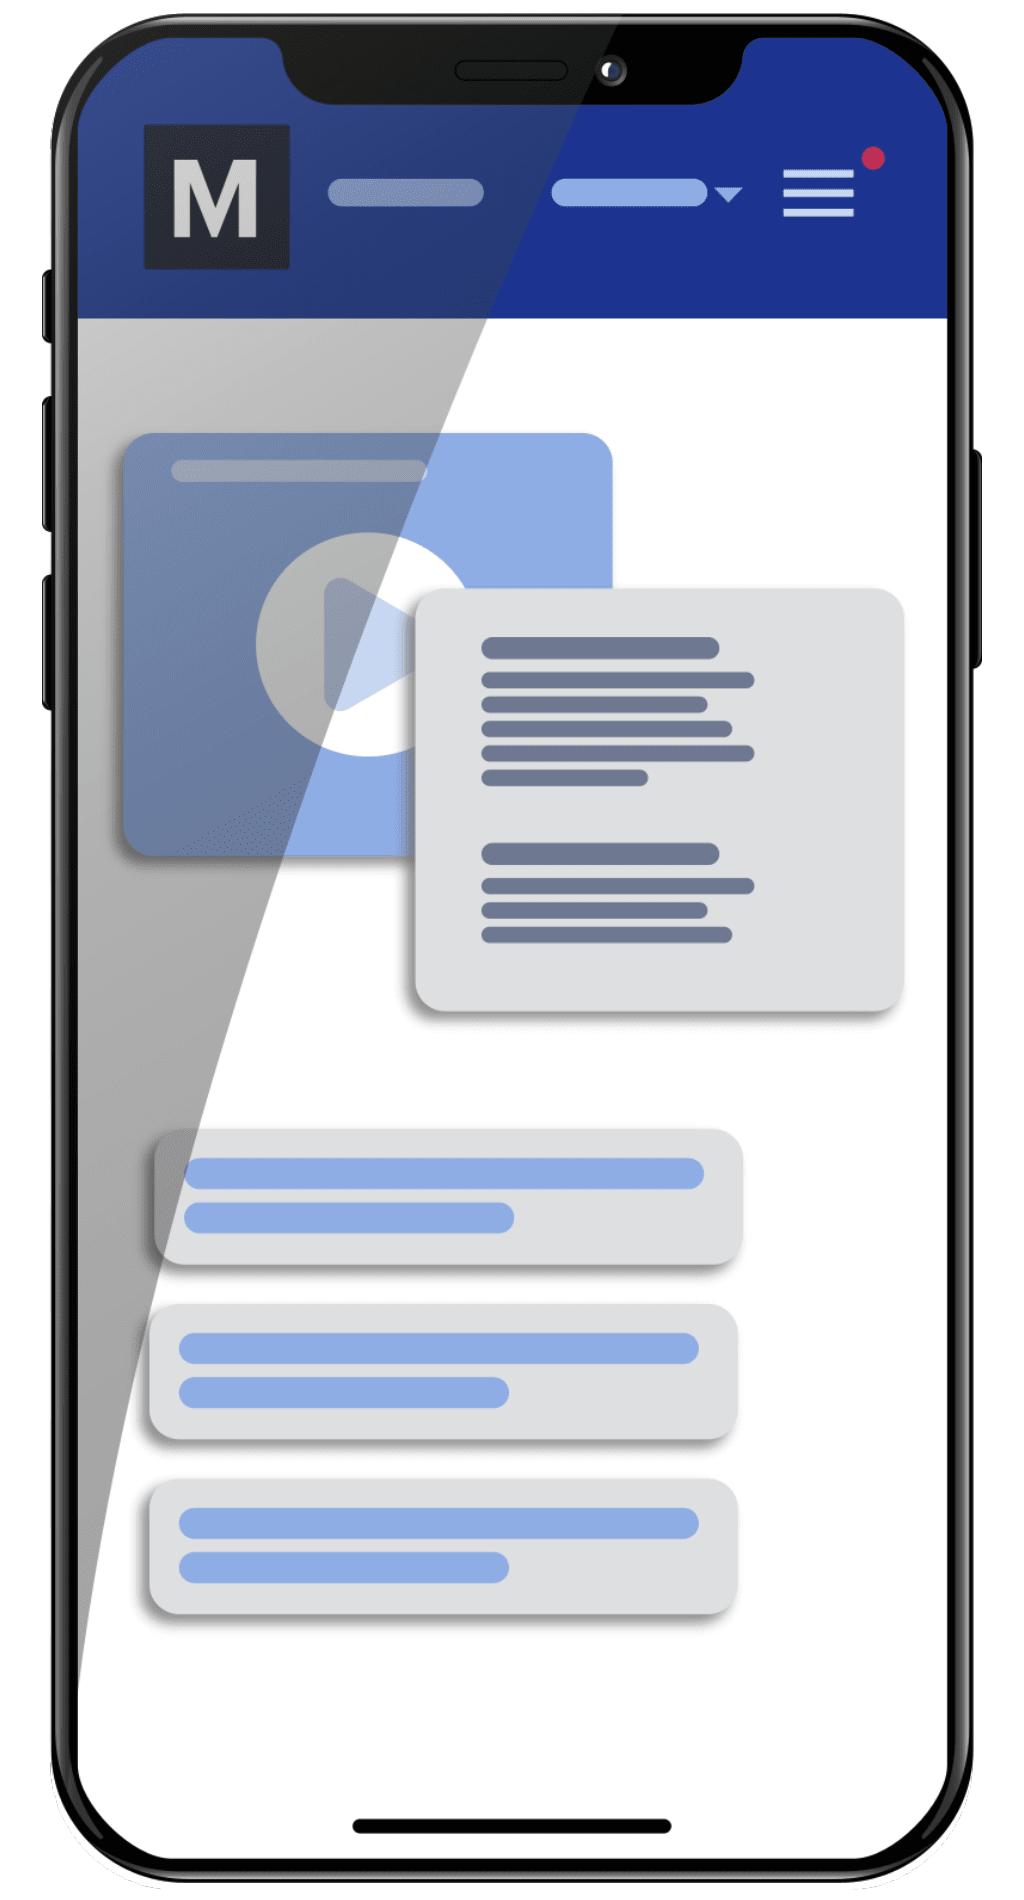 Medify on mobile phone